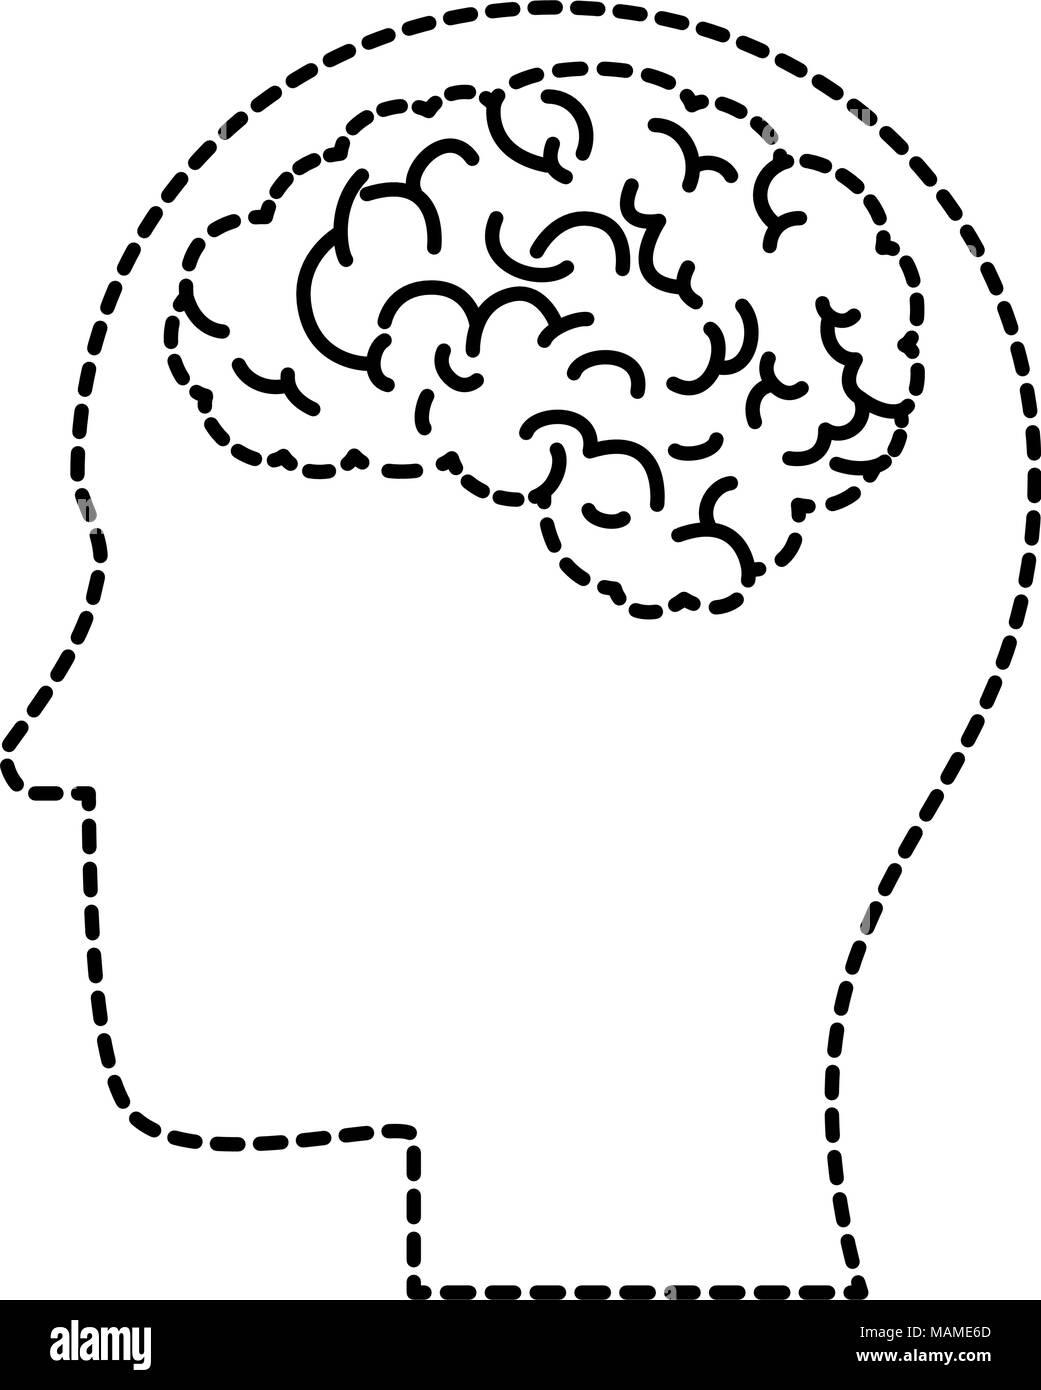 profile with brain human organ icon - Stock Image